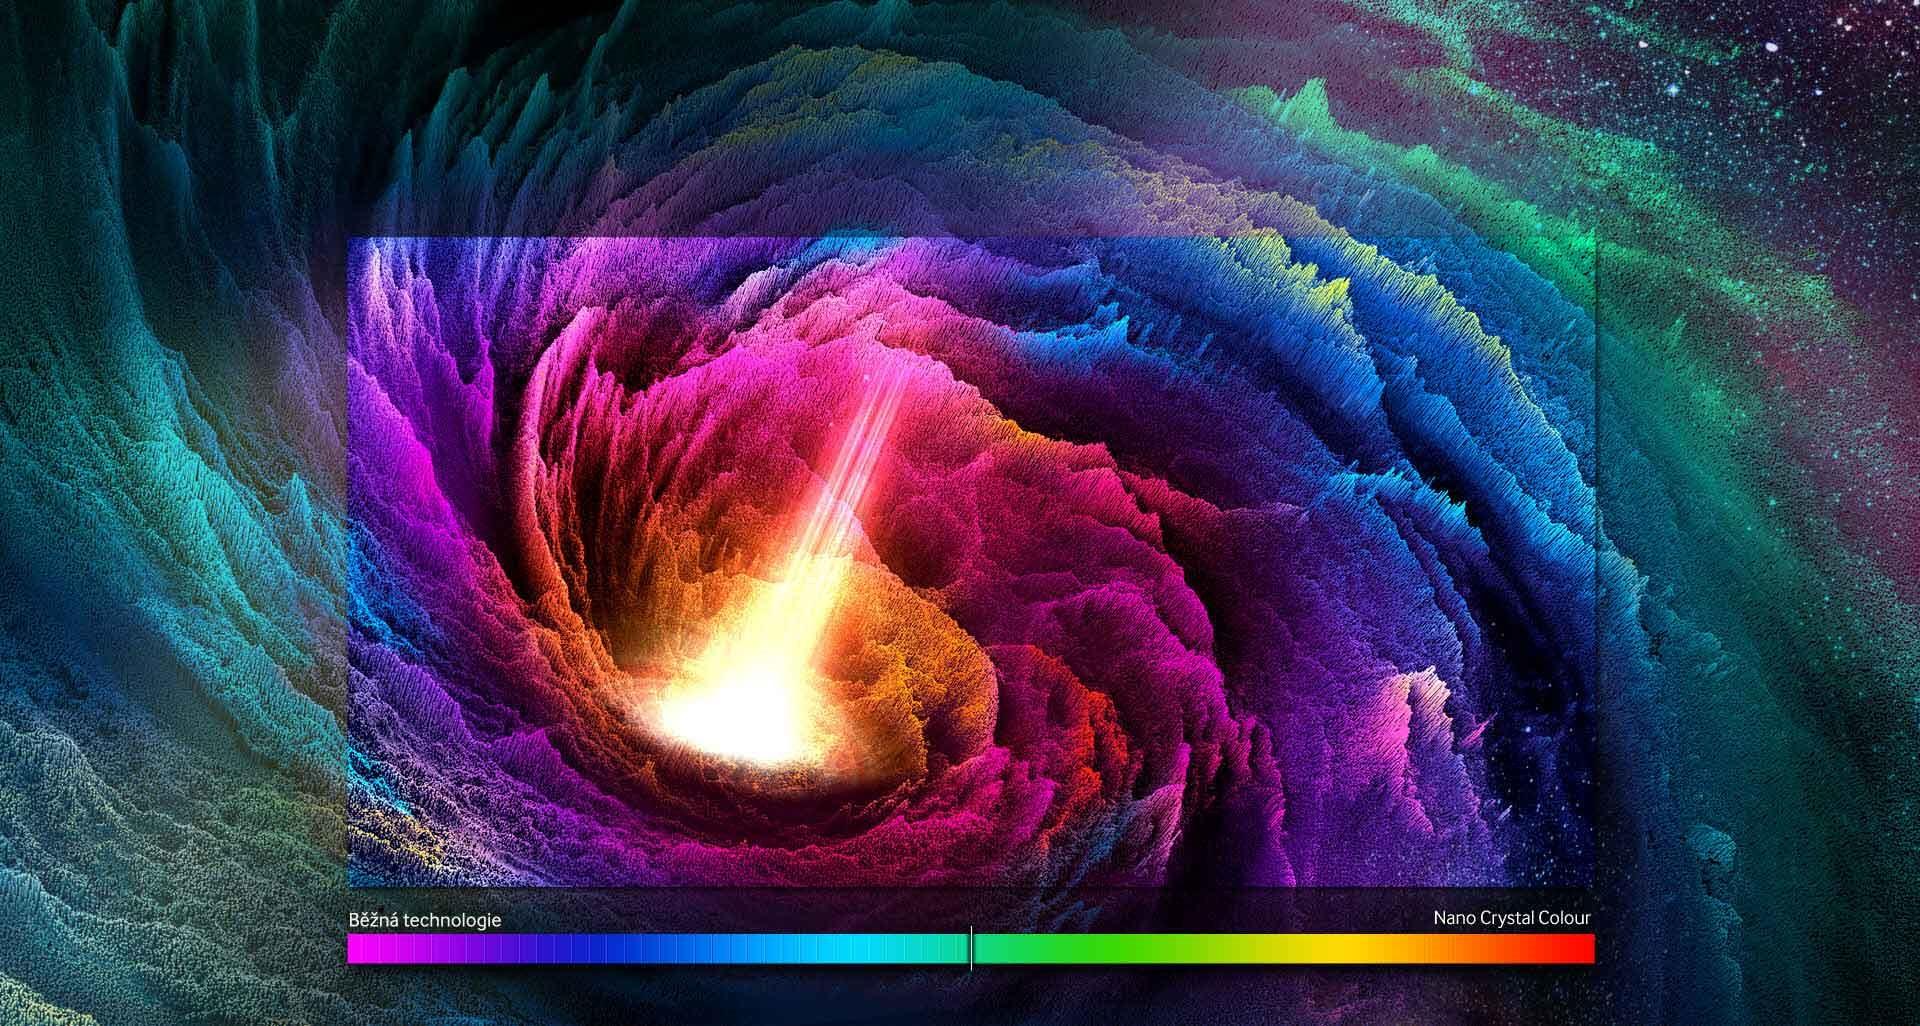 Fantastický obraz, dokonalé barvy